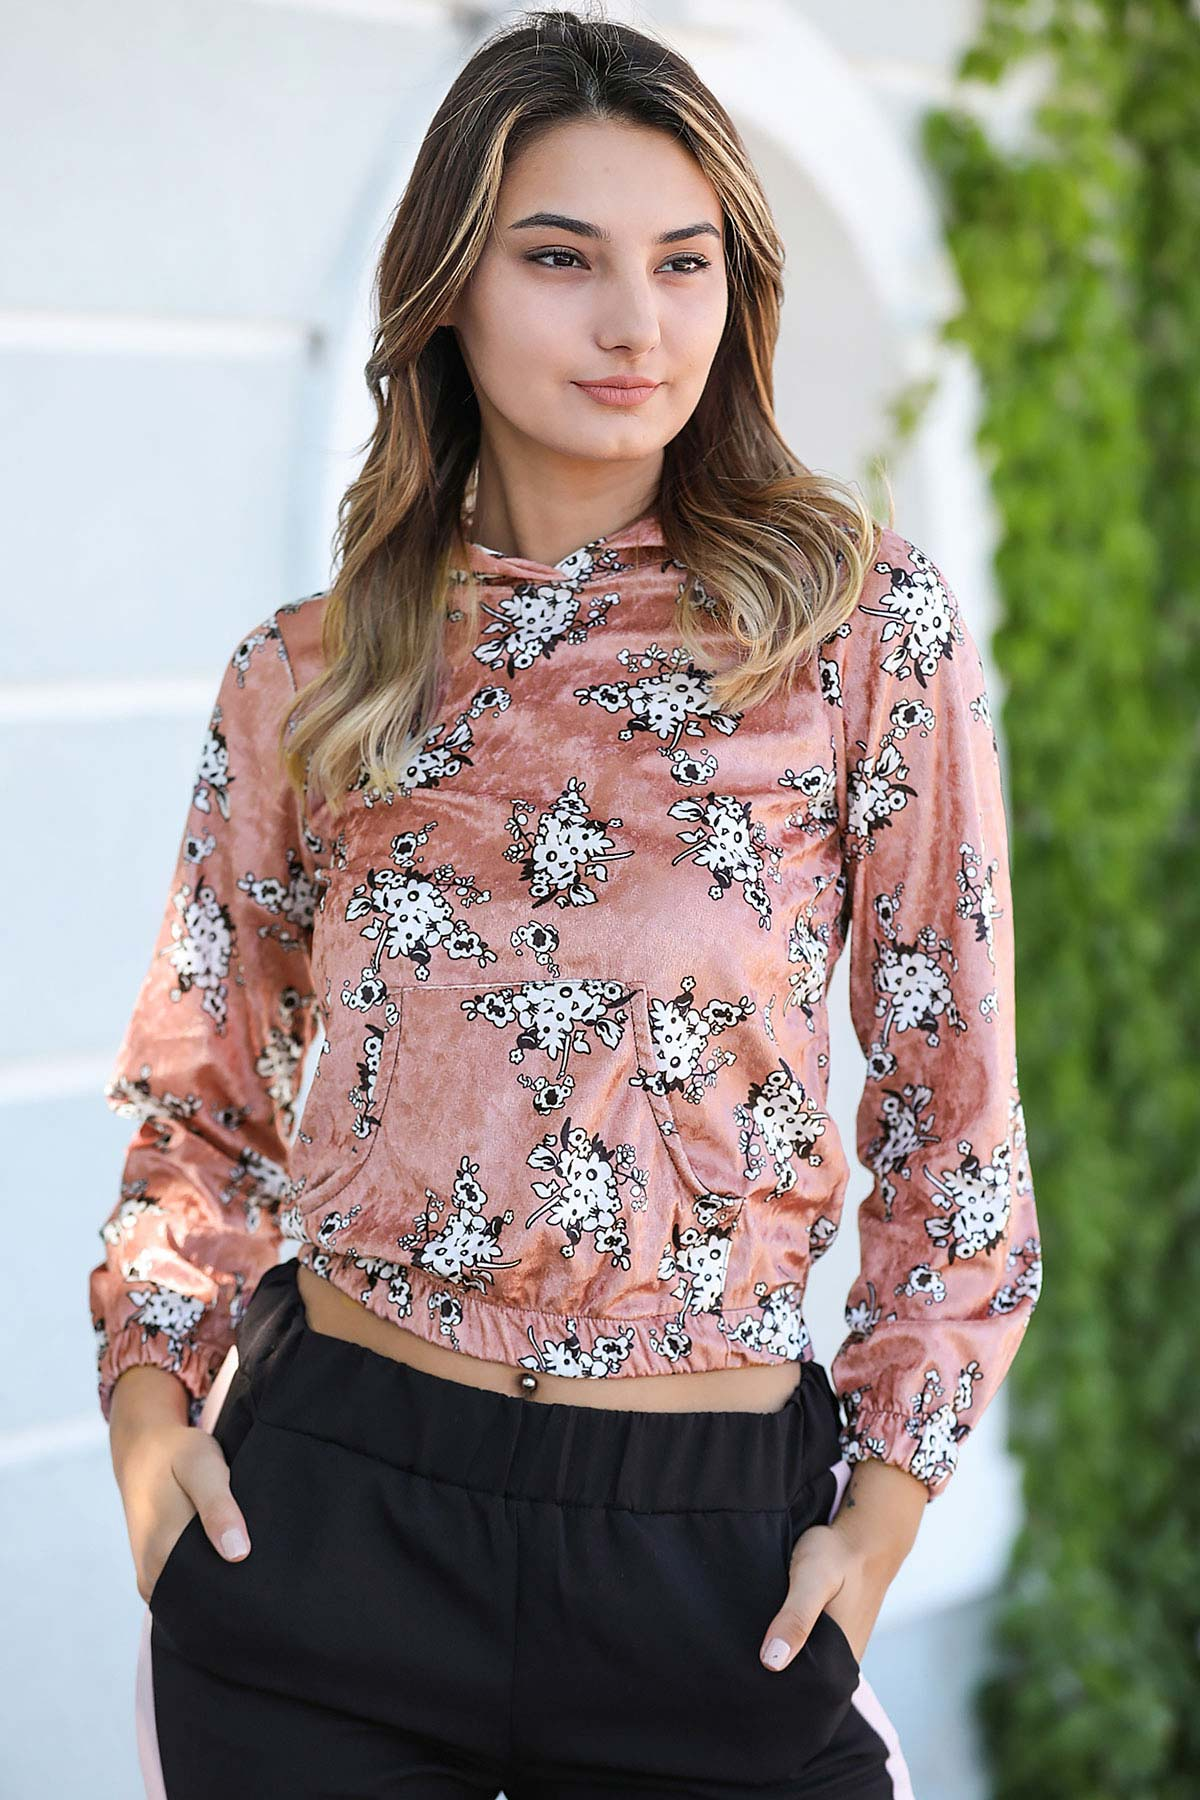 Women's Hooded Patterned Dusty Rose Velvet Sweatshirt